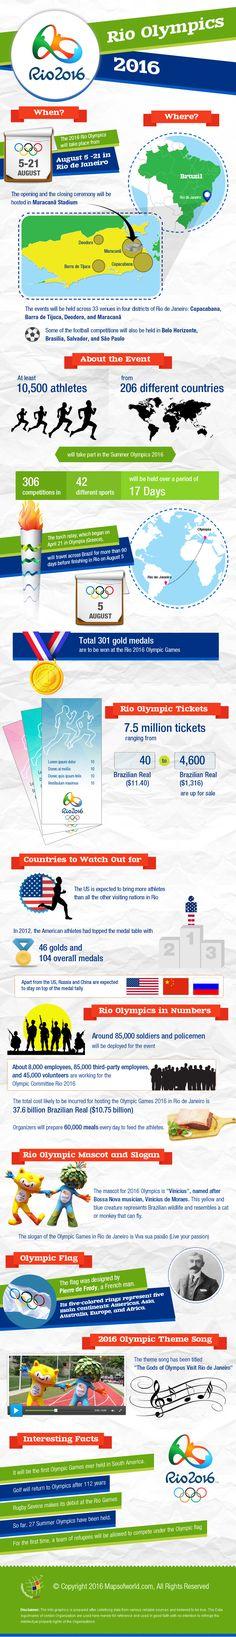 Rio 2016 Olympics Infographic                                                                                                                                                      More